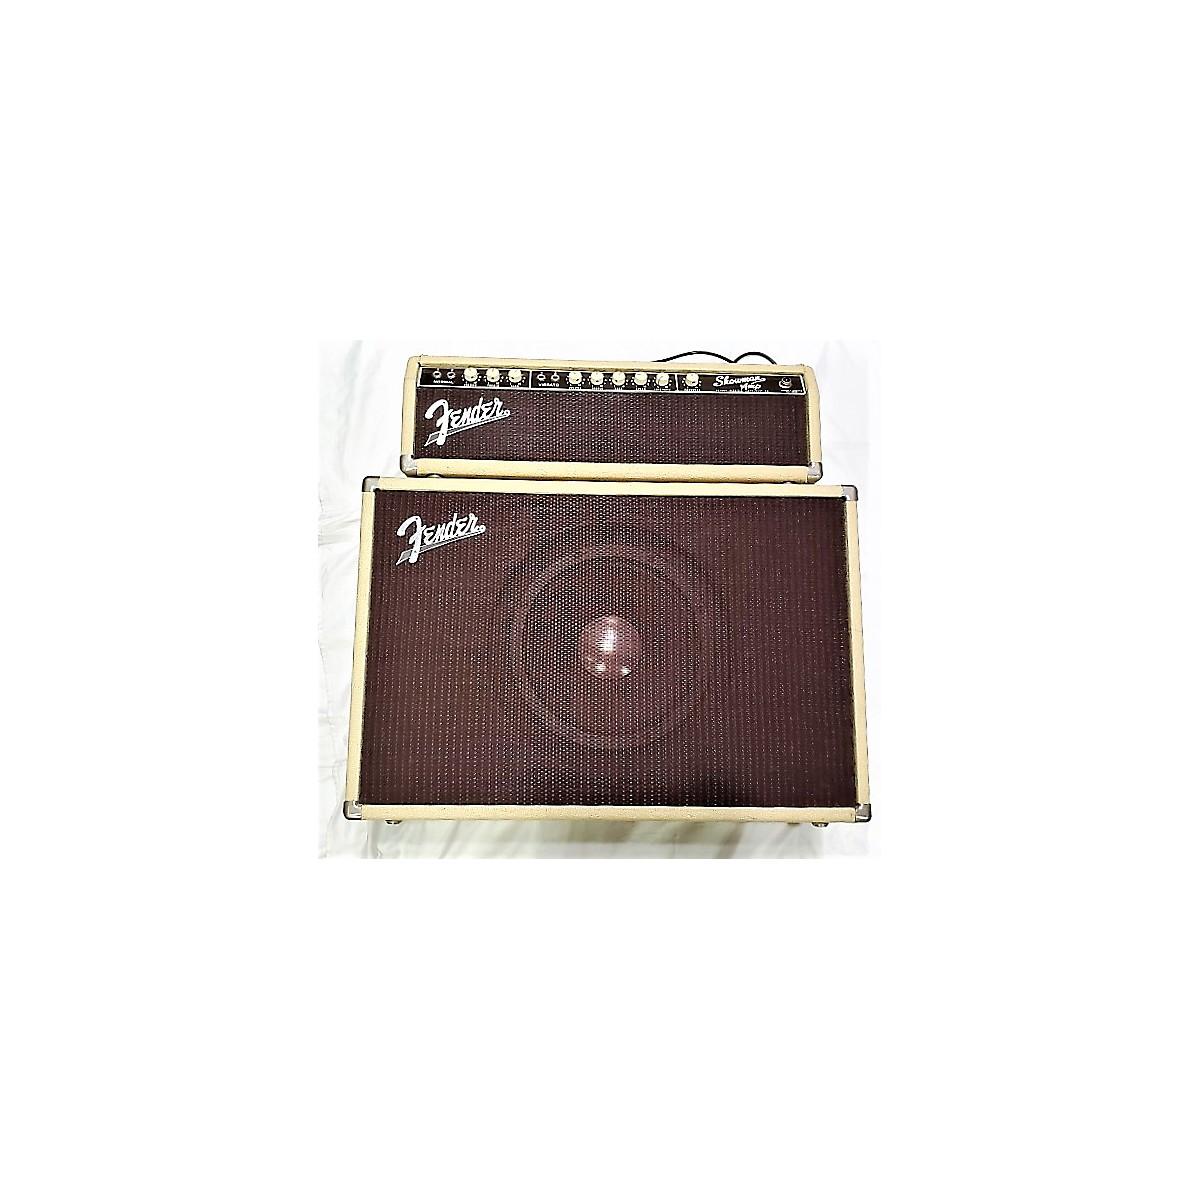 Fender 1961 Showman 12 Amp W/ Cab Tube Guitar Combo Amp